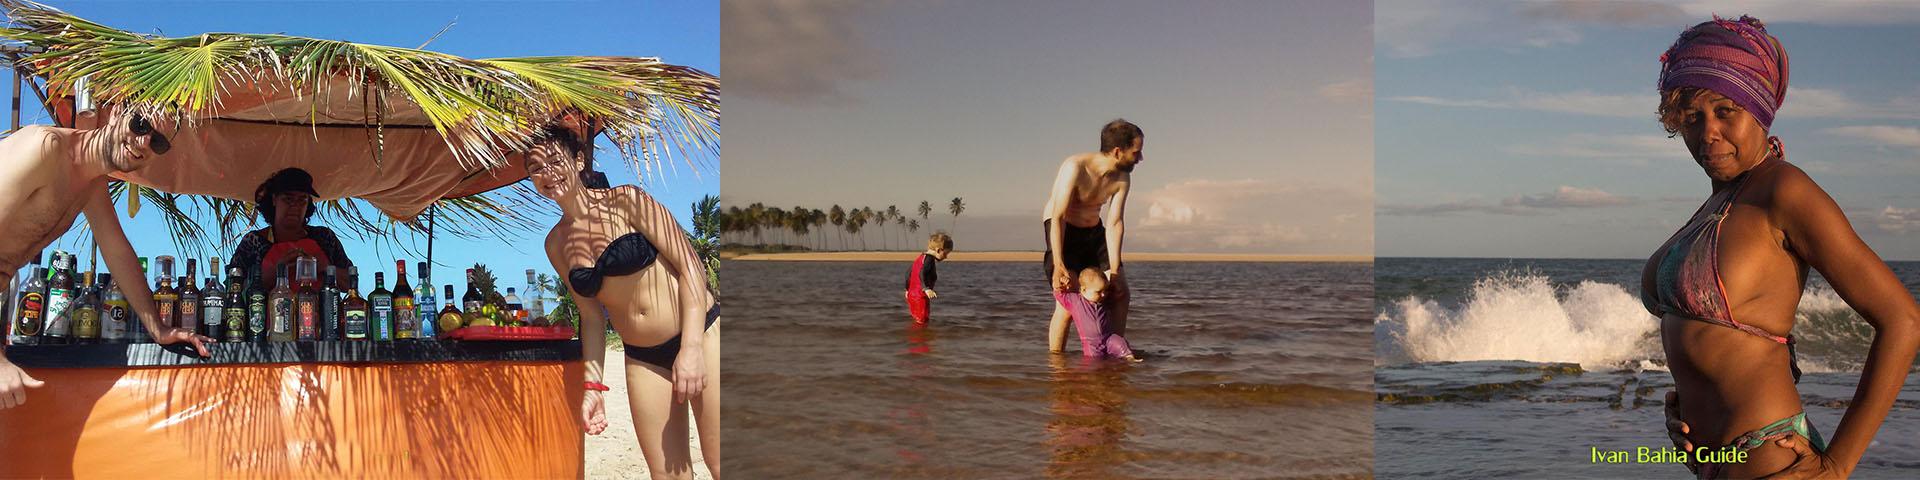 Ivan Bahia Guide - daytour Praia do Forte, Arembepe, Jacuipe aphrodisiac beaches